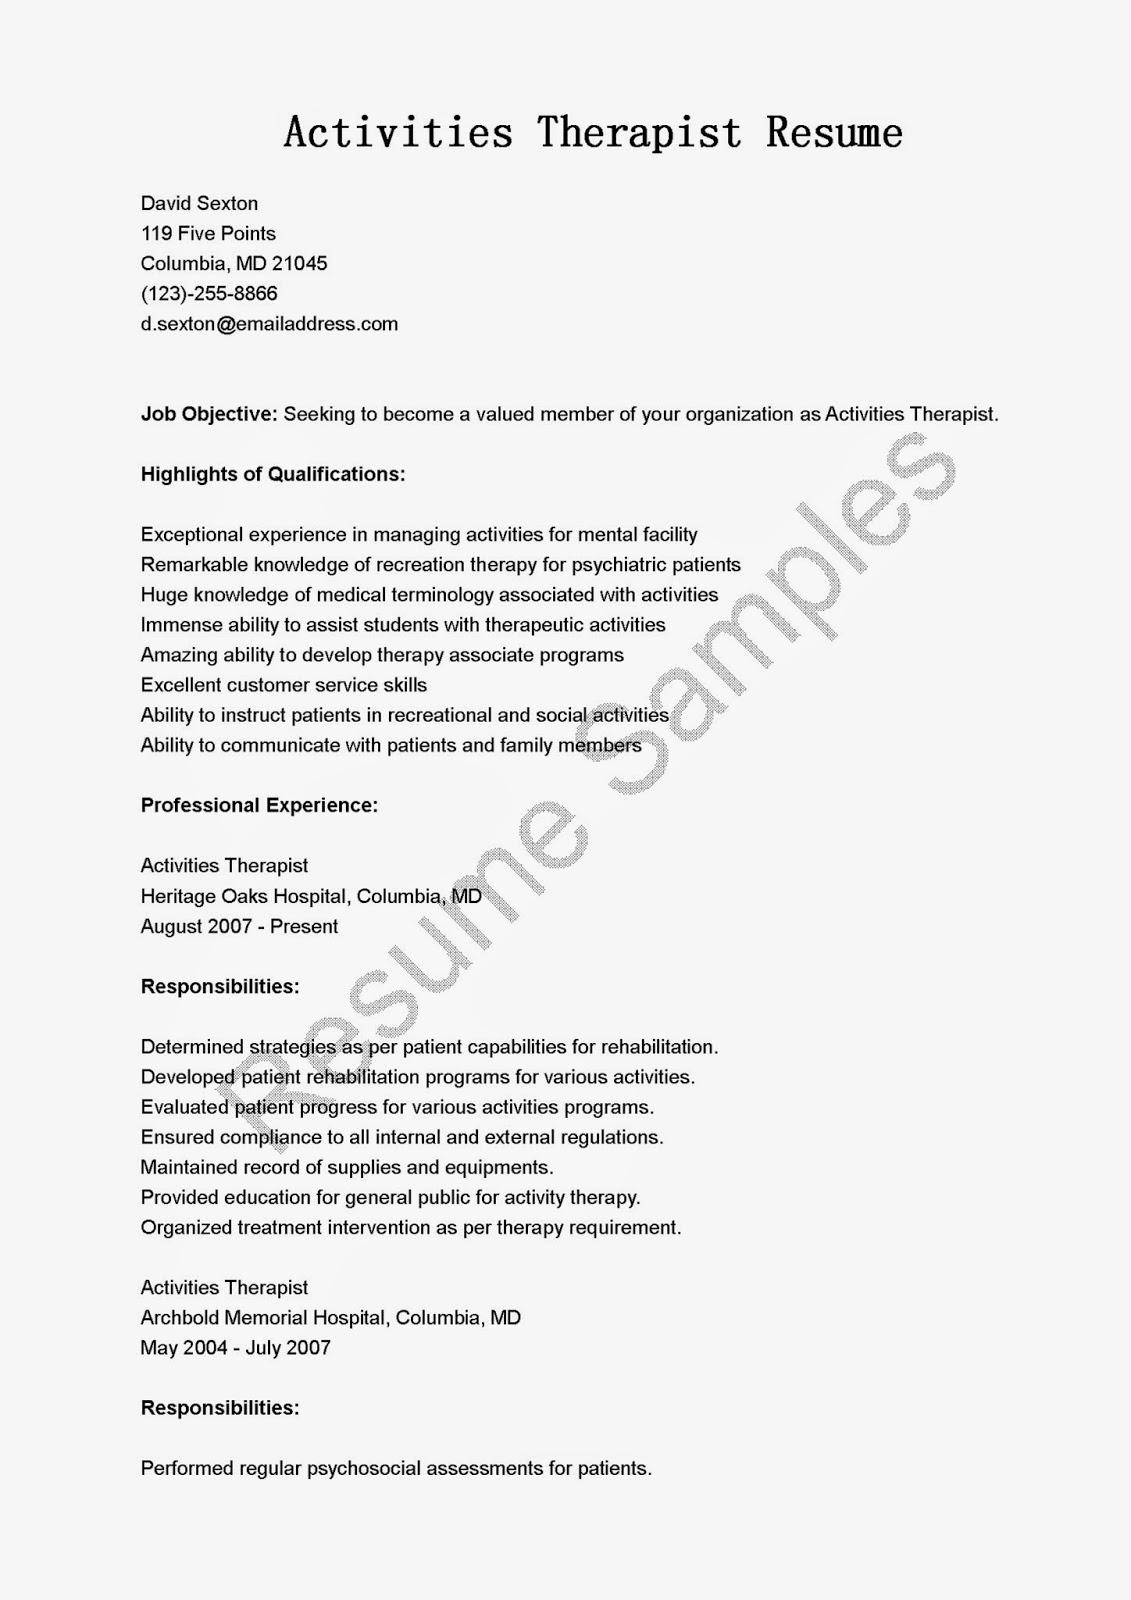 Resume Samples Activities Therapist Resume Sample